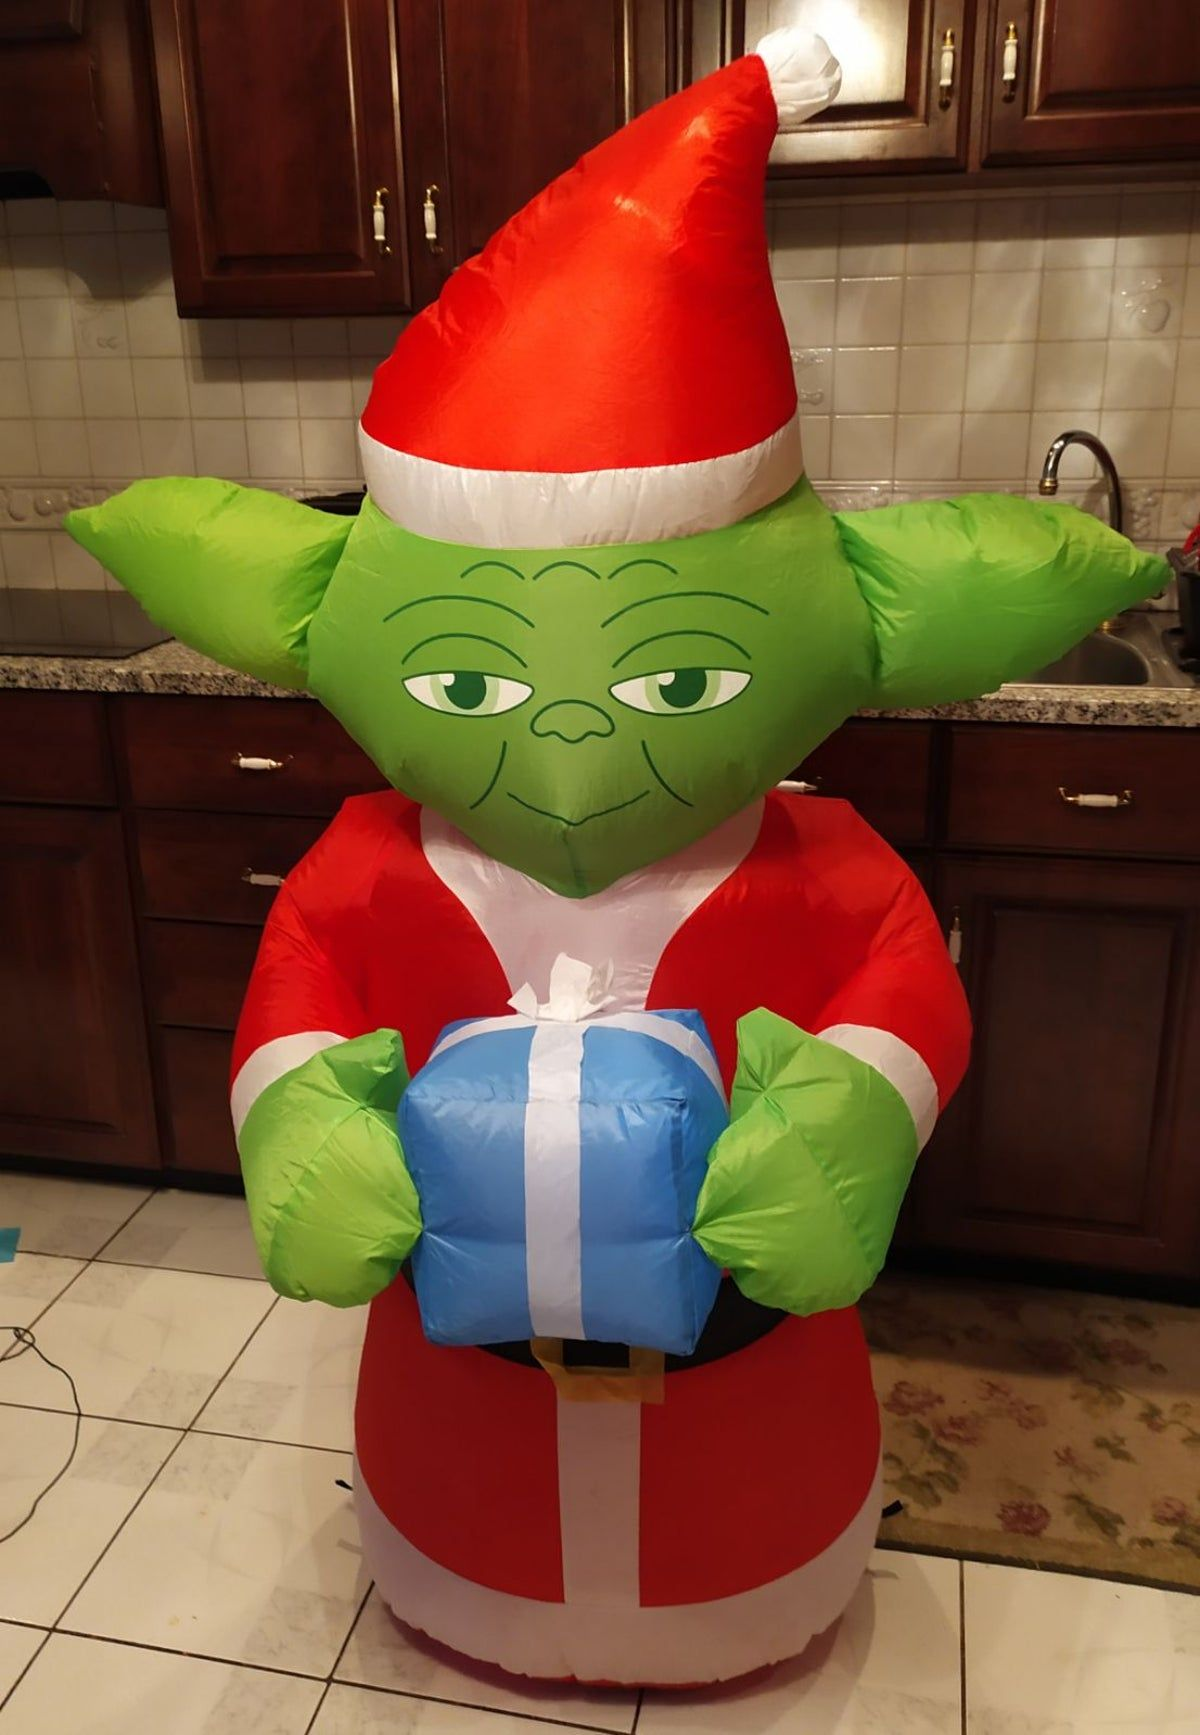 Star Wars Yoda Inflatable In 2021 Star Wars Yoda Star Wars Halloween Christmas Inflatables